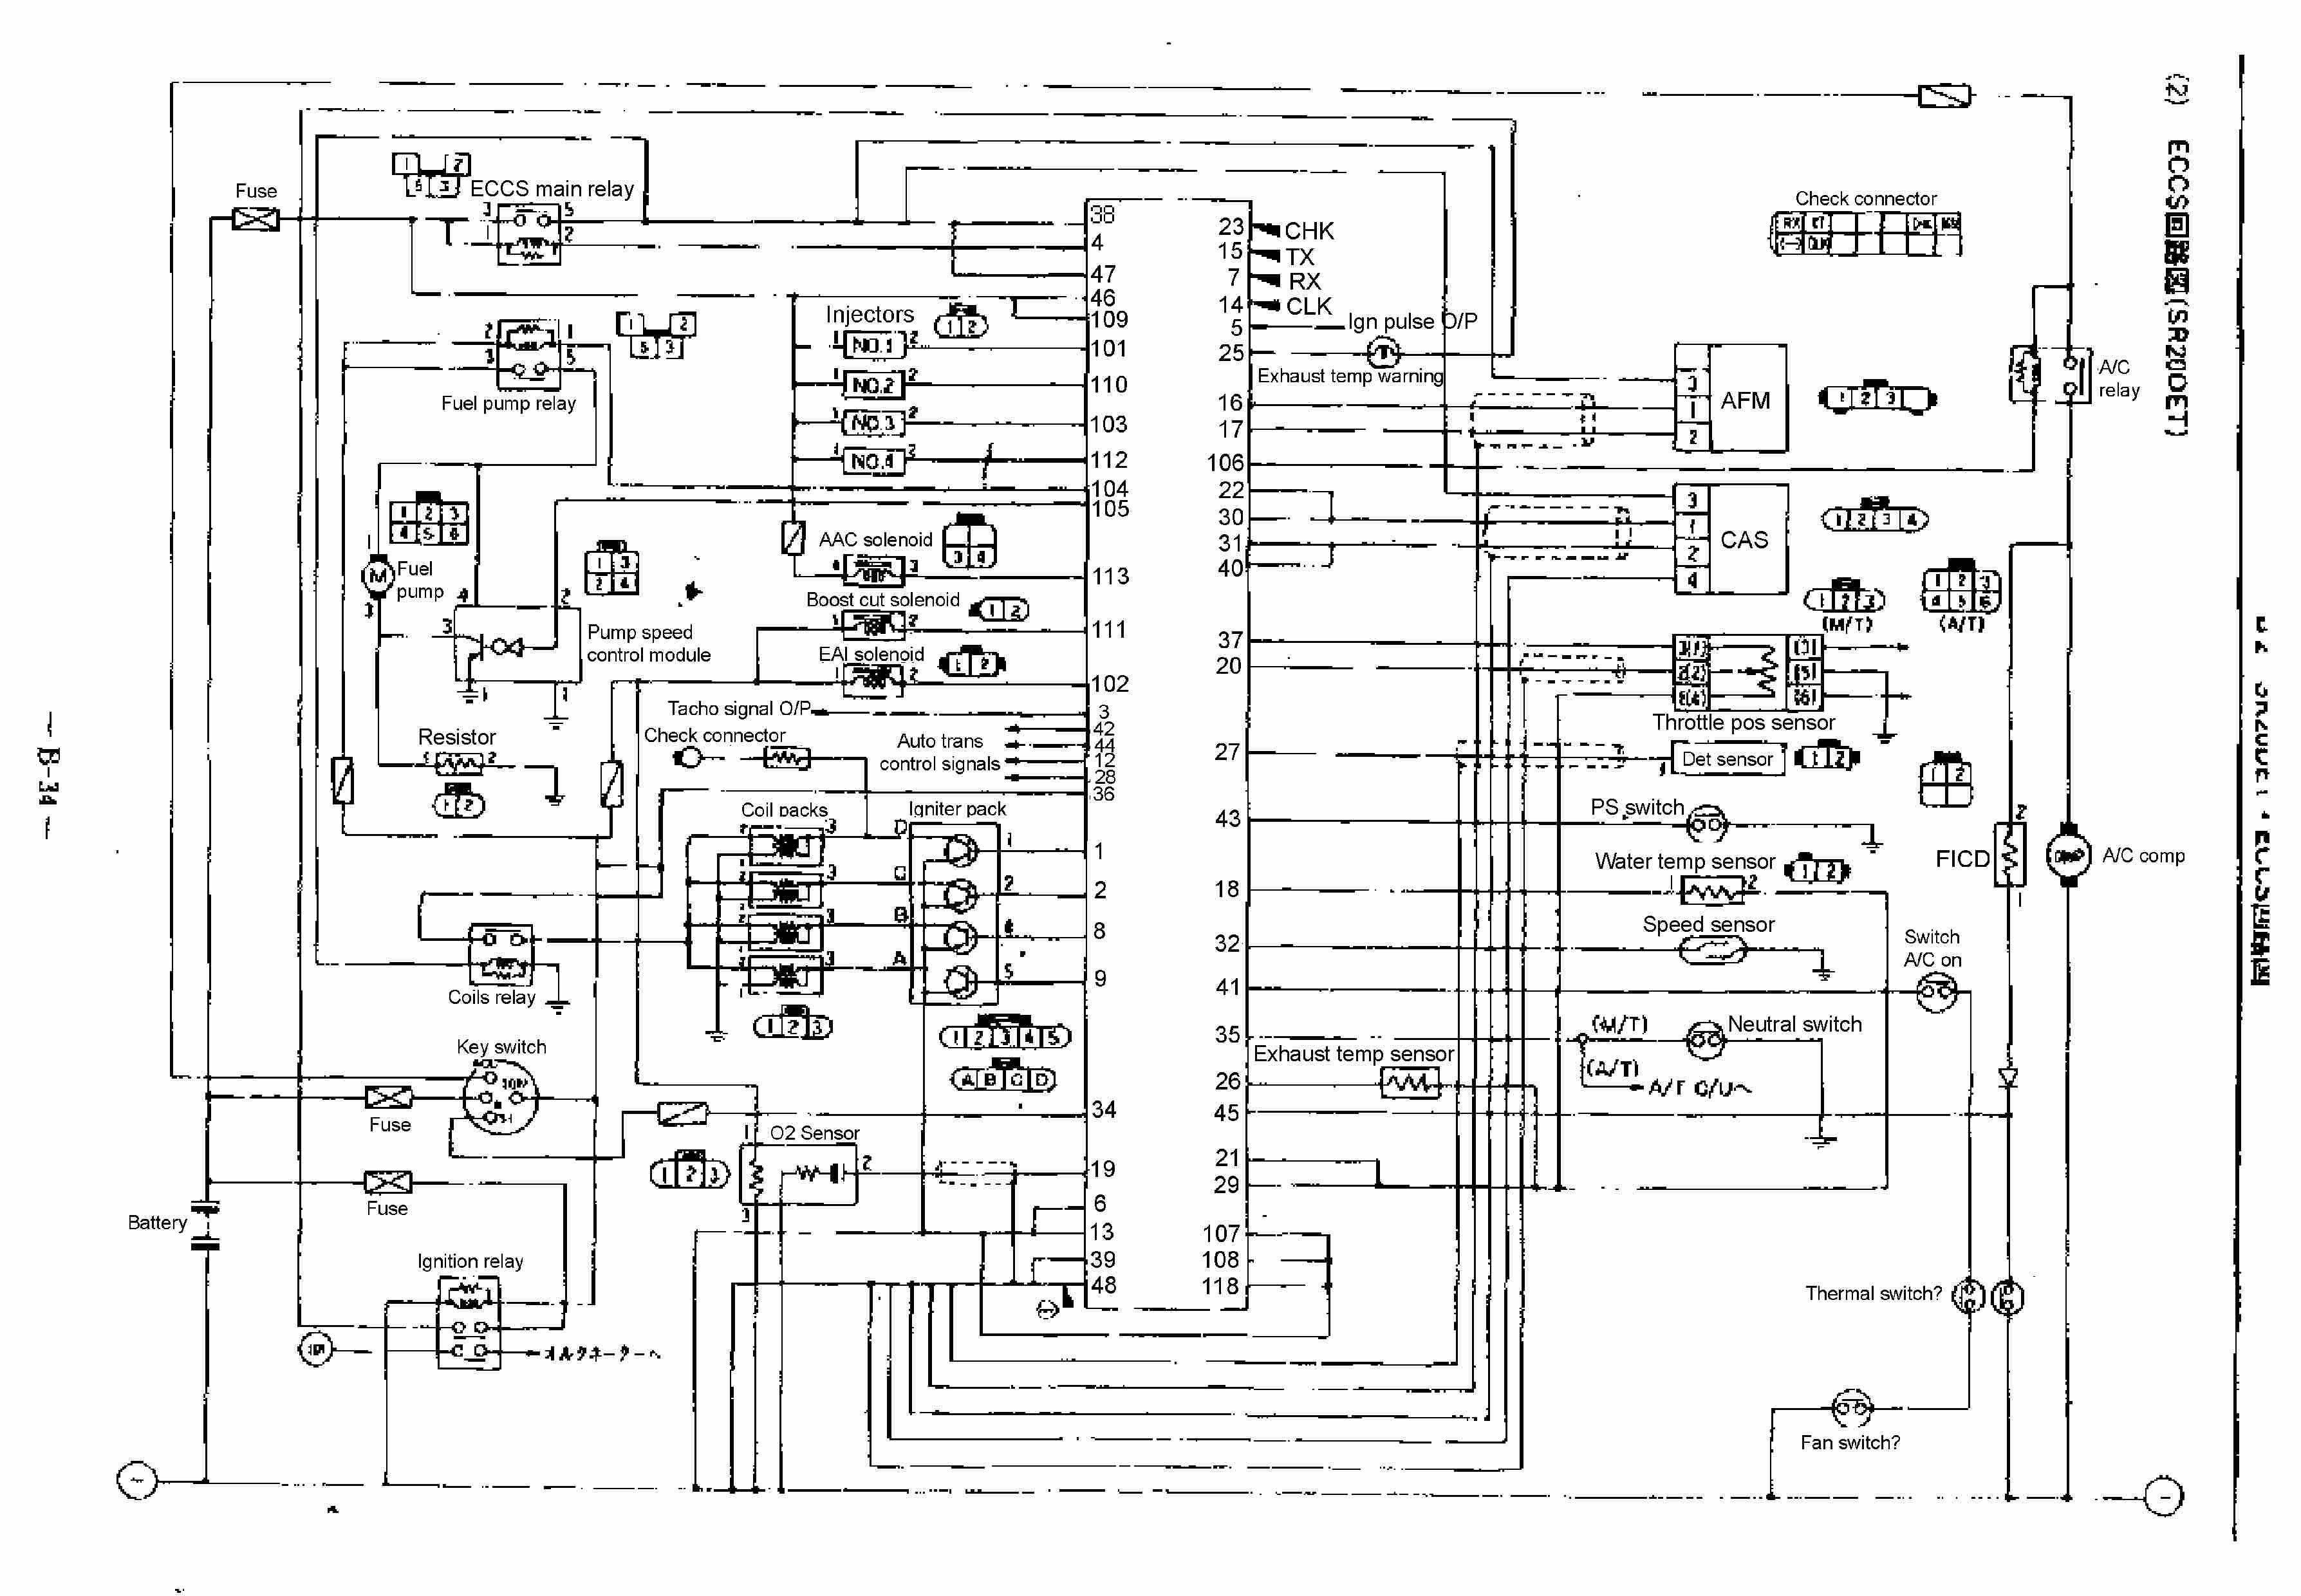 Awesome Md3060 Allison Transmission Wiring Diagram In 2020 Electrical Diagram Diagram Alternator